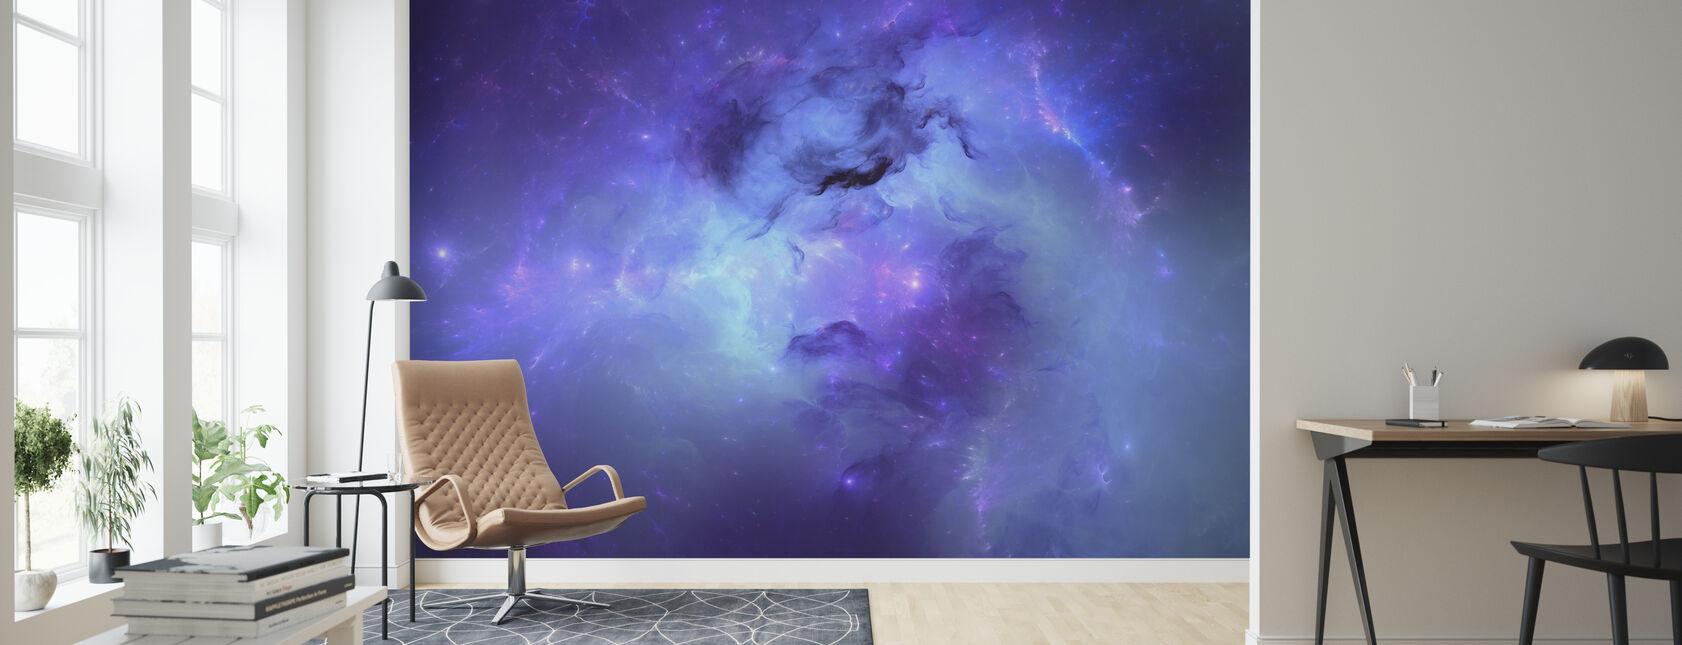 Blue Nebula - Wallpaper - Living Room